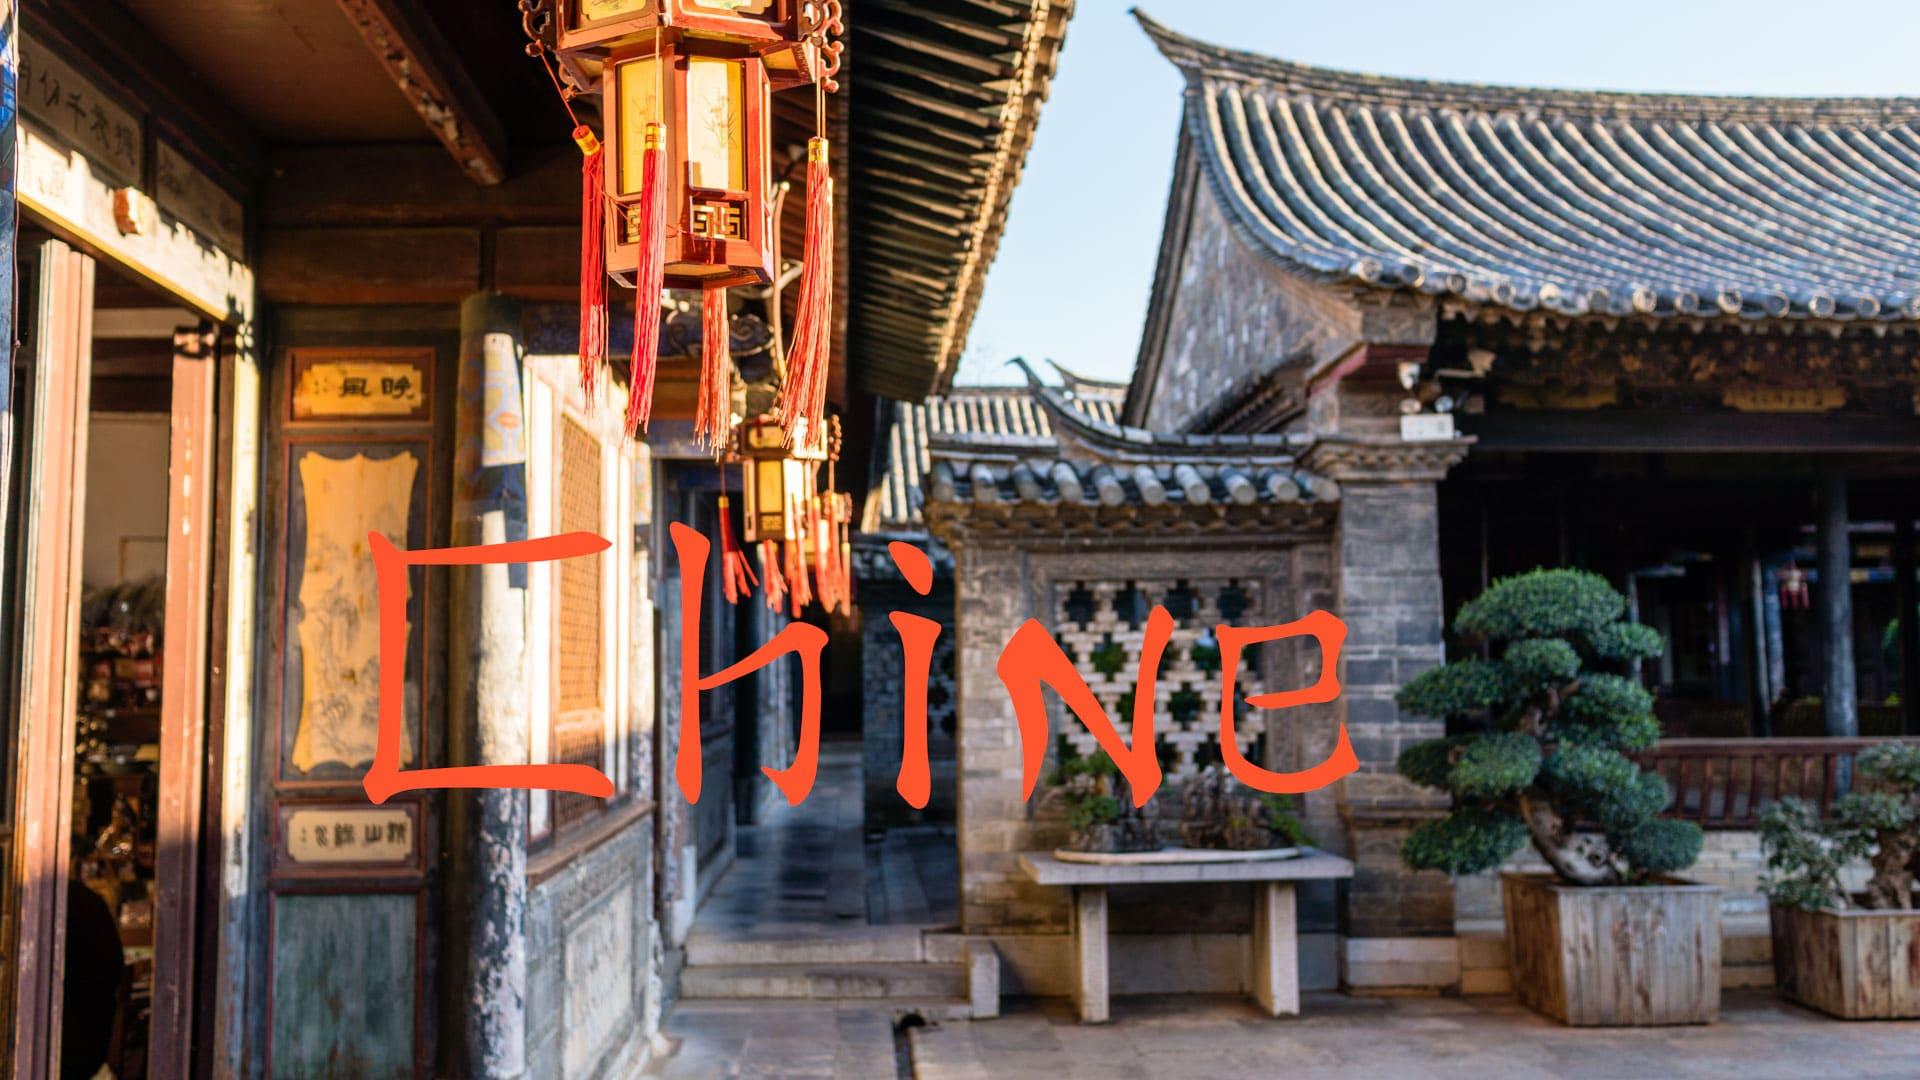 SerialHikers stop autostop world monde tour hitchhiking aventure adventure alternative travel voyage sans avion no fly china chine destination guide